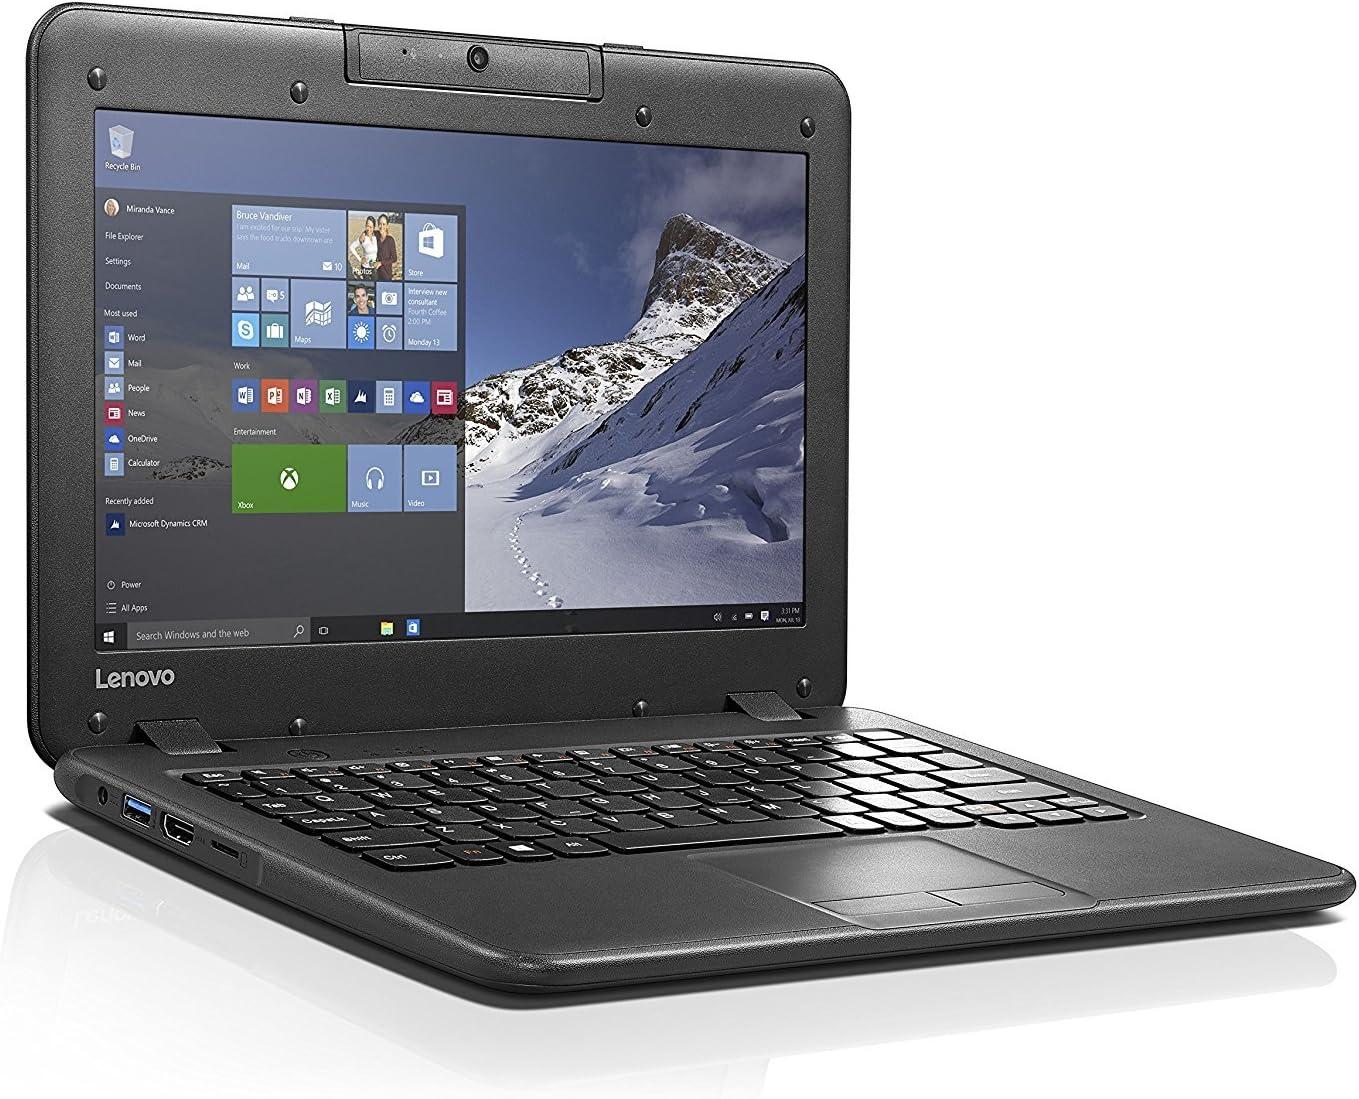 Lenovo N22 11.6-inch High Performance Laptop Notebook (New Premium Edition) (Intel Dual-Core Processor N3060 1.60GHz, 4GB RAM, 64GB eMMC SSD,Windows 10 Pro)